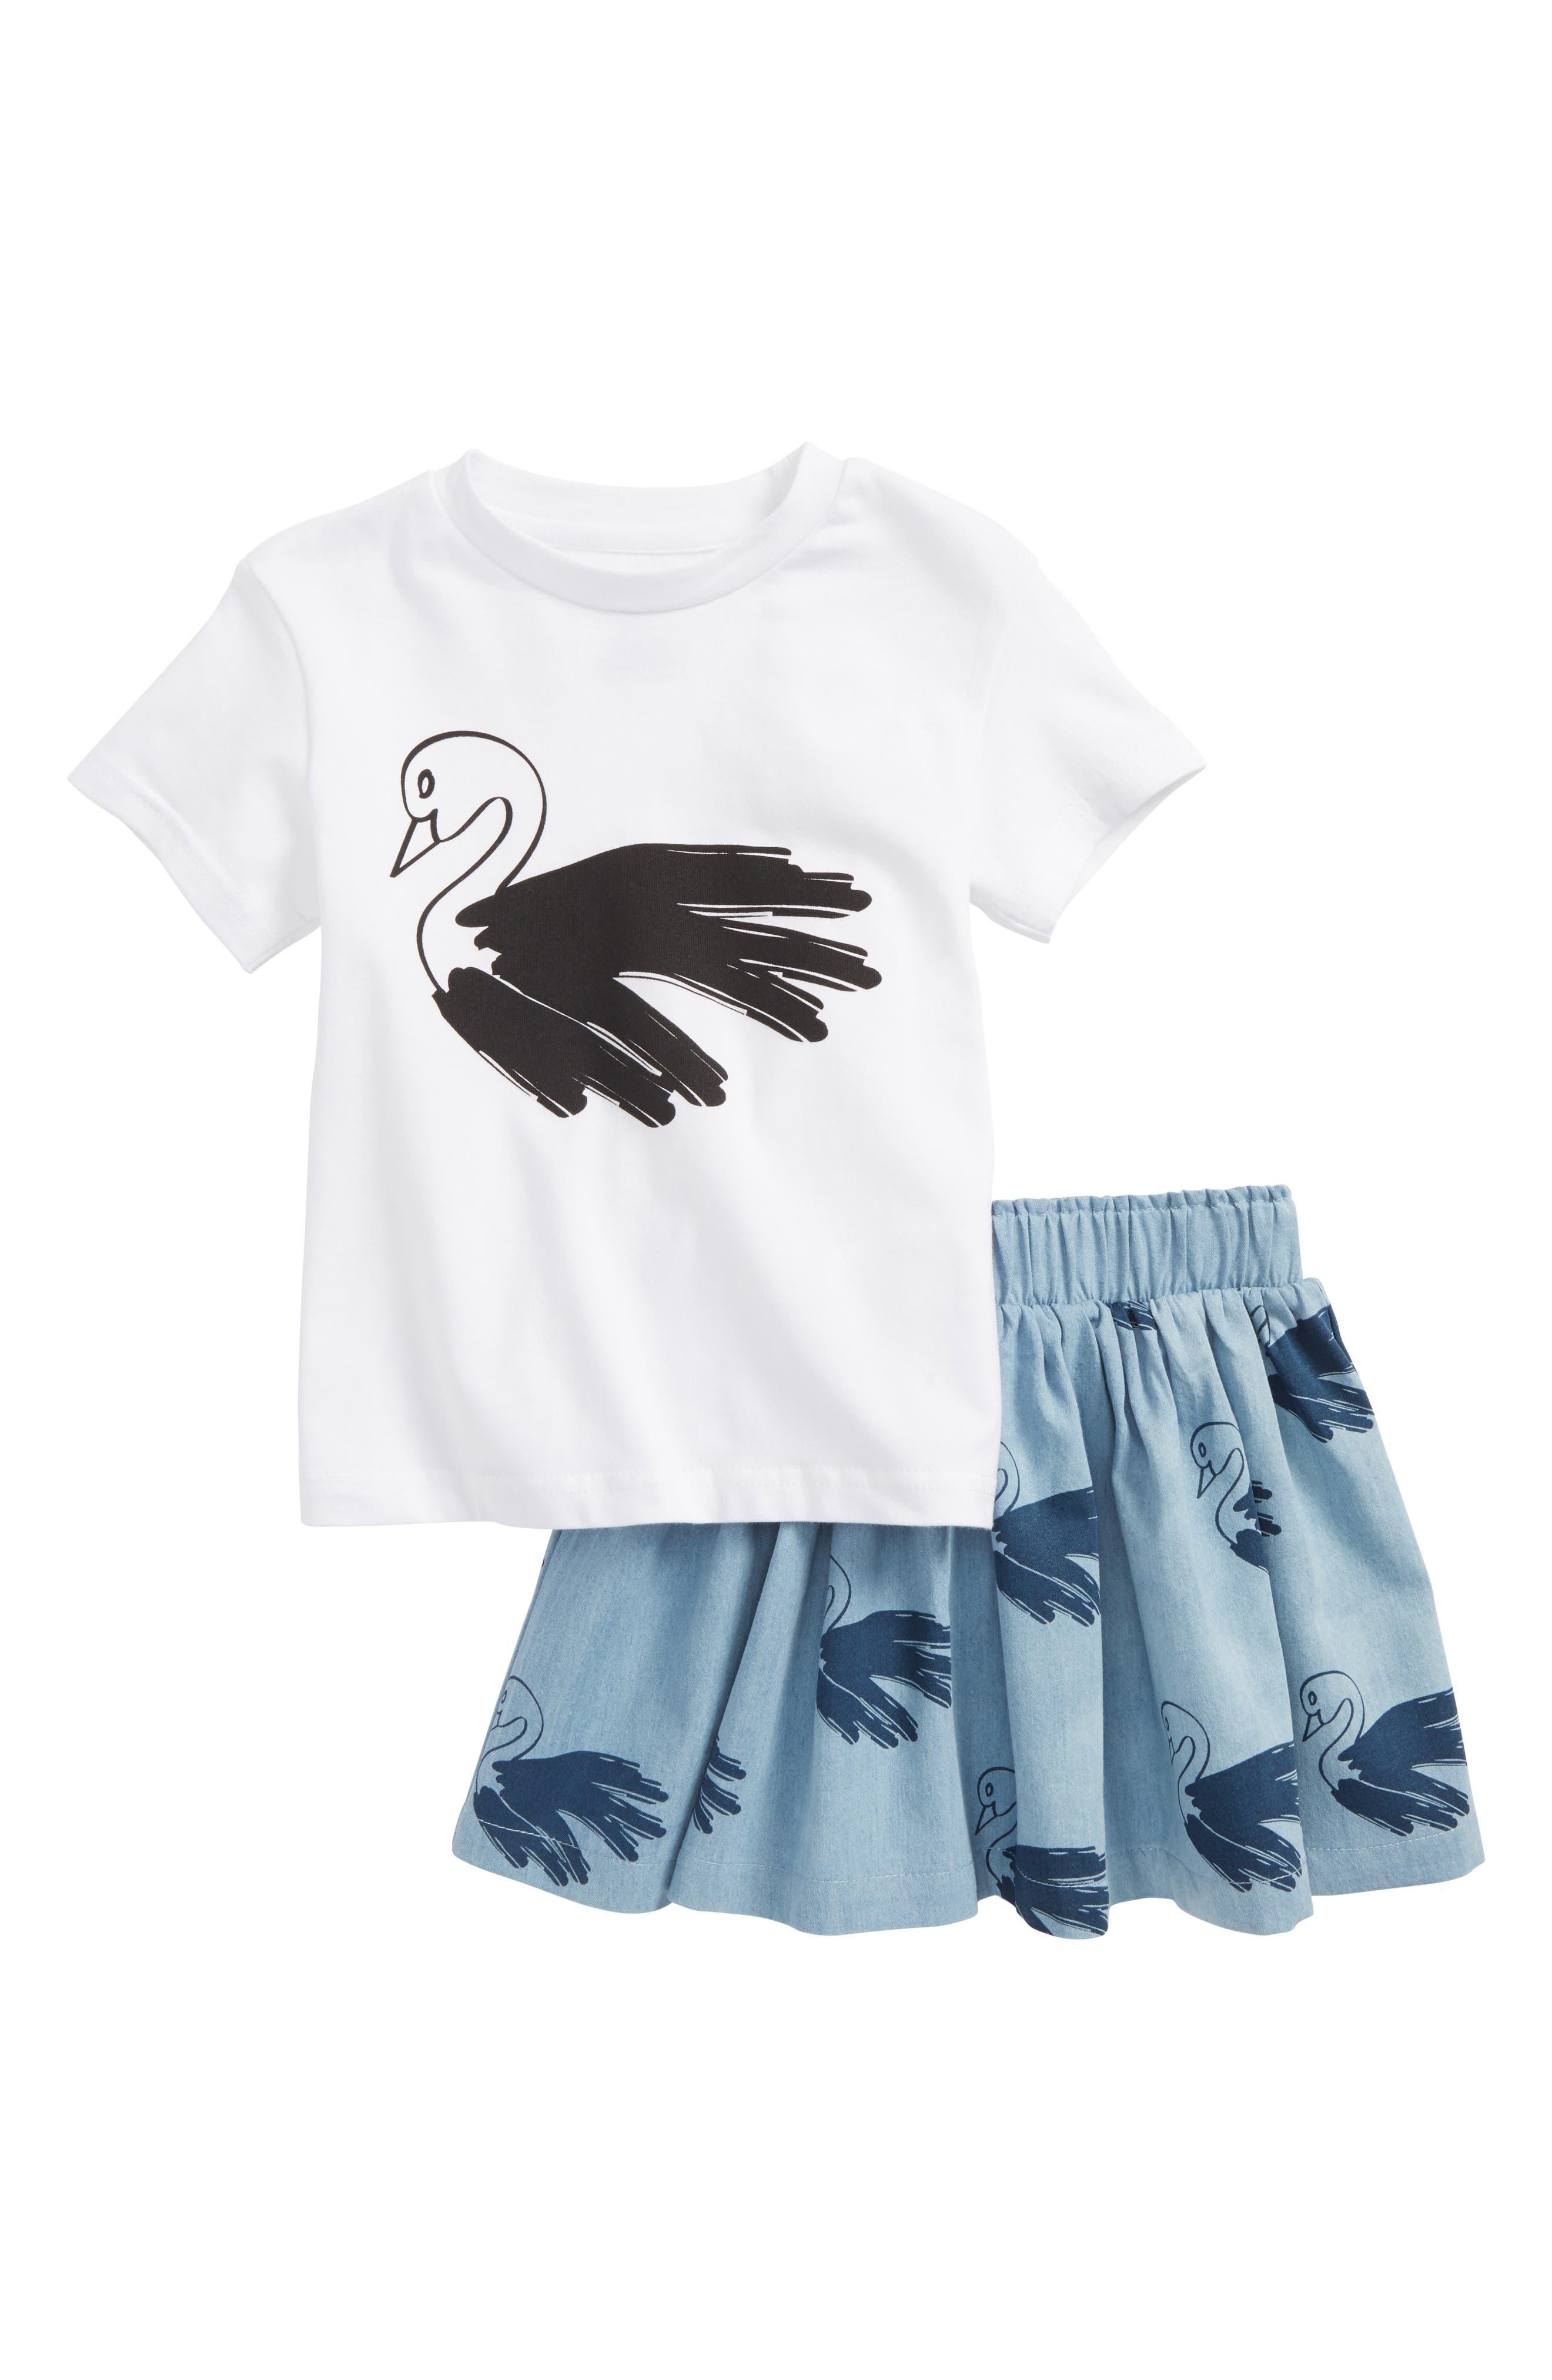 Swan Tee & Chambray Skirt Set,                         Main,                         color, White / Chambray